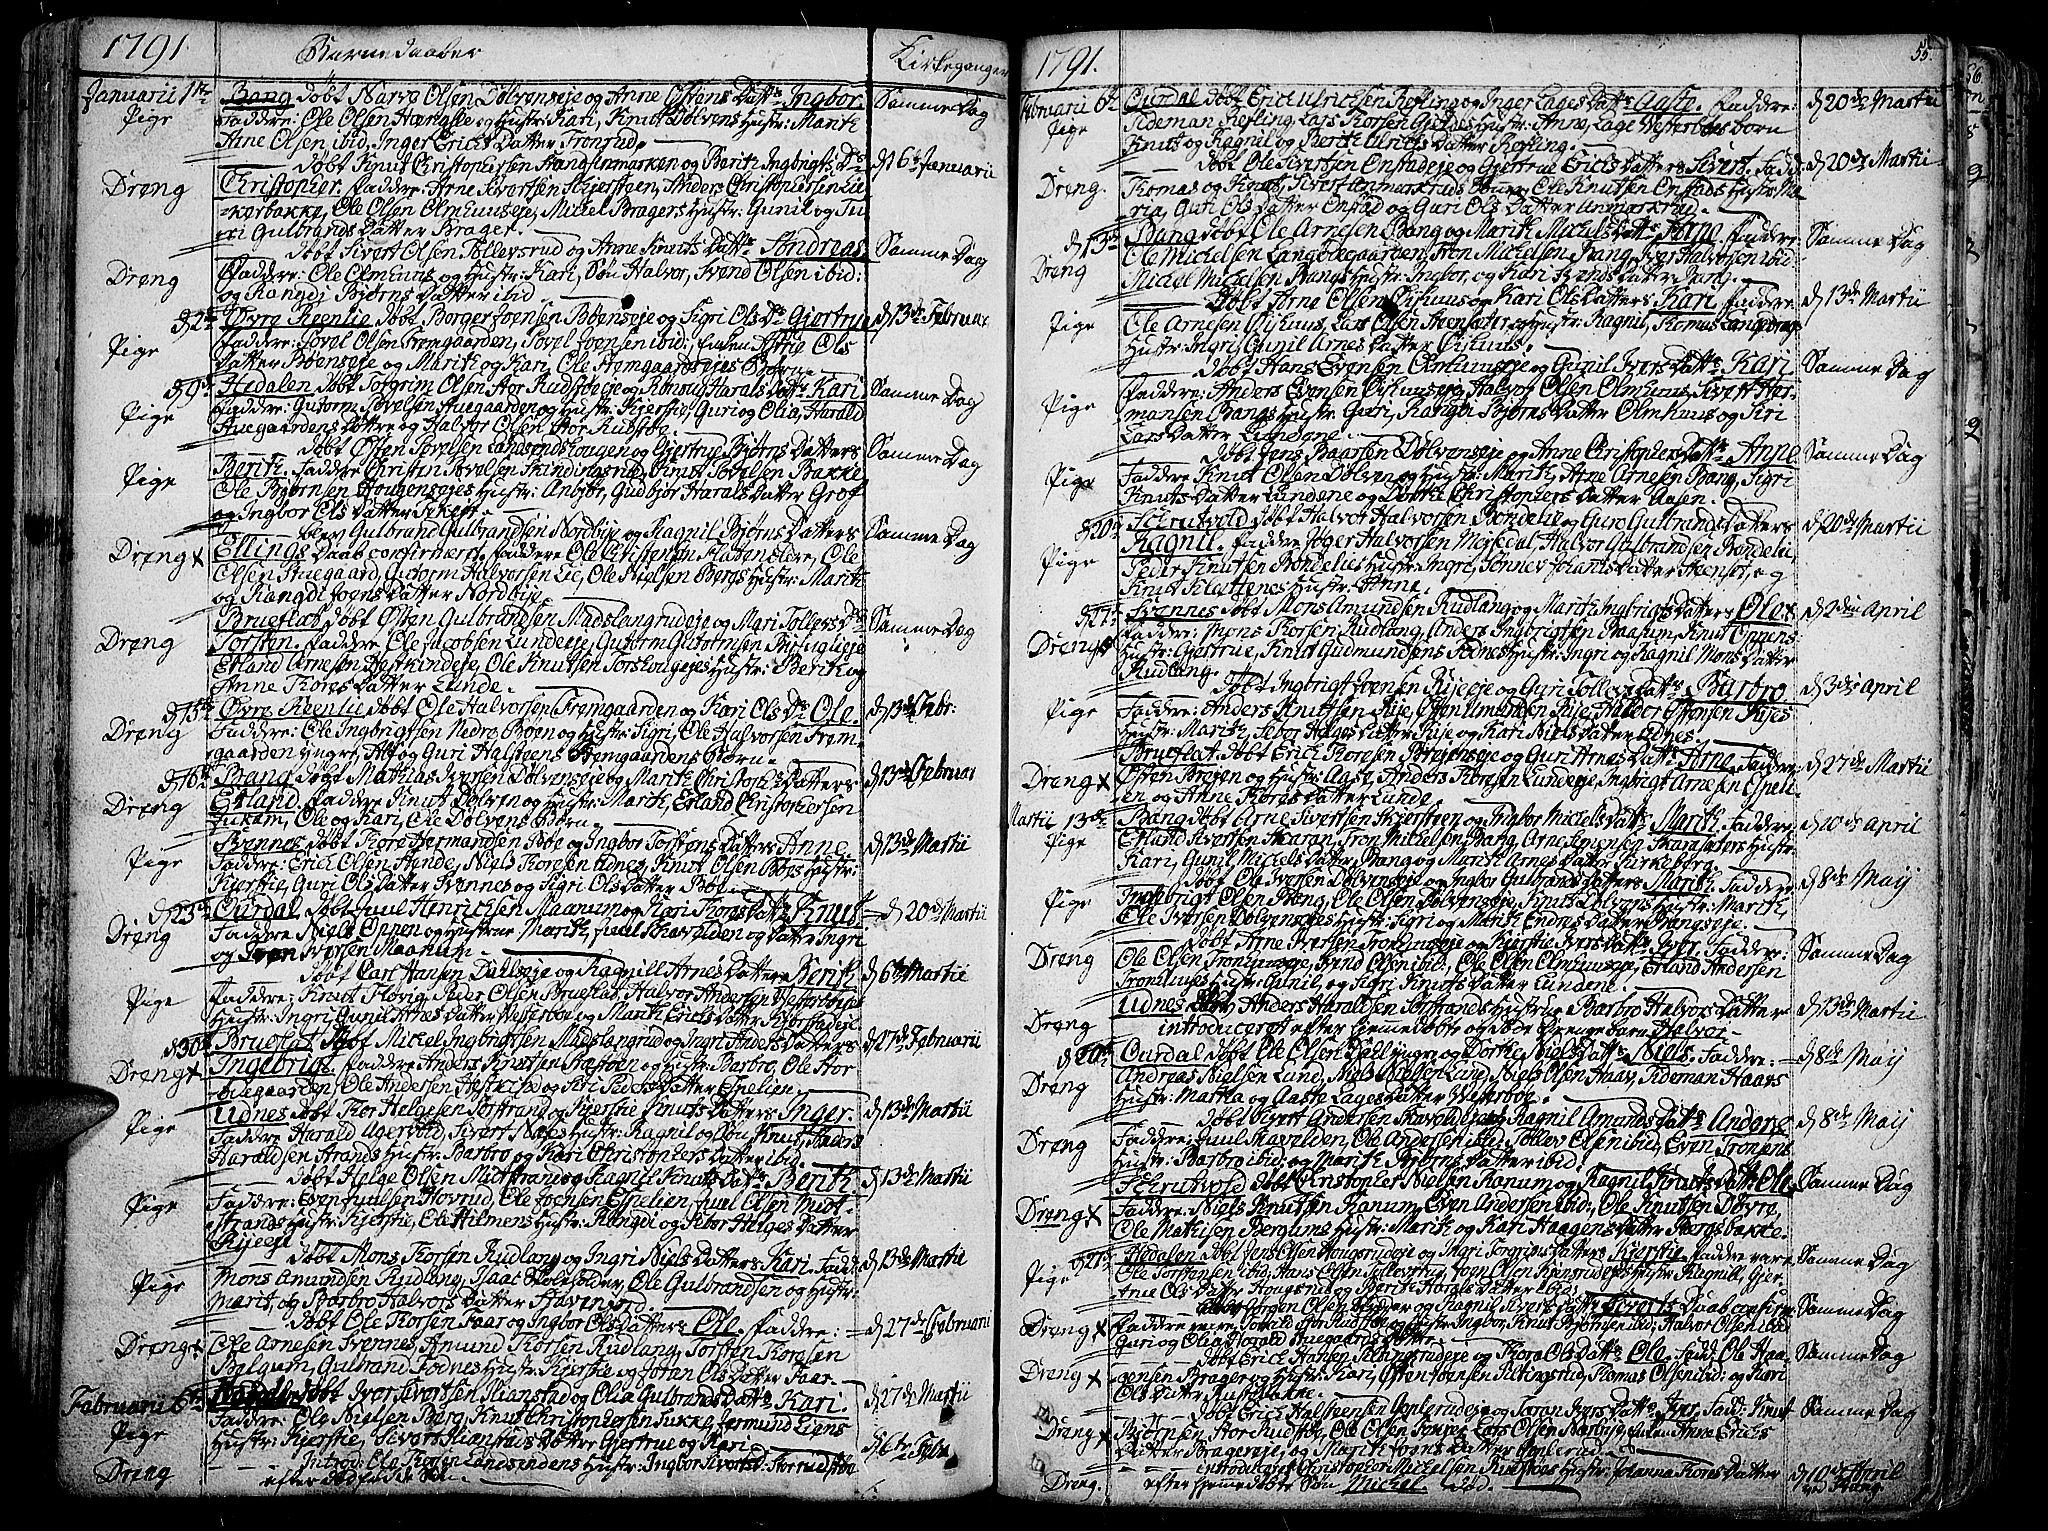 SAH, Aurdal prestekontor, Ministerialbok nr. 6, 1781-1804, s. 55